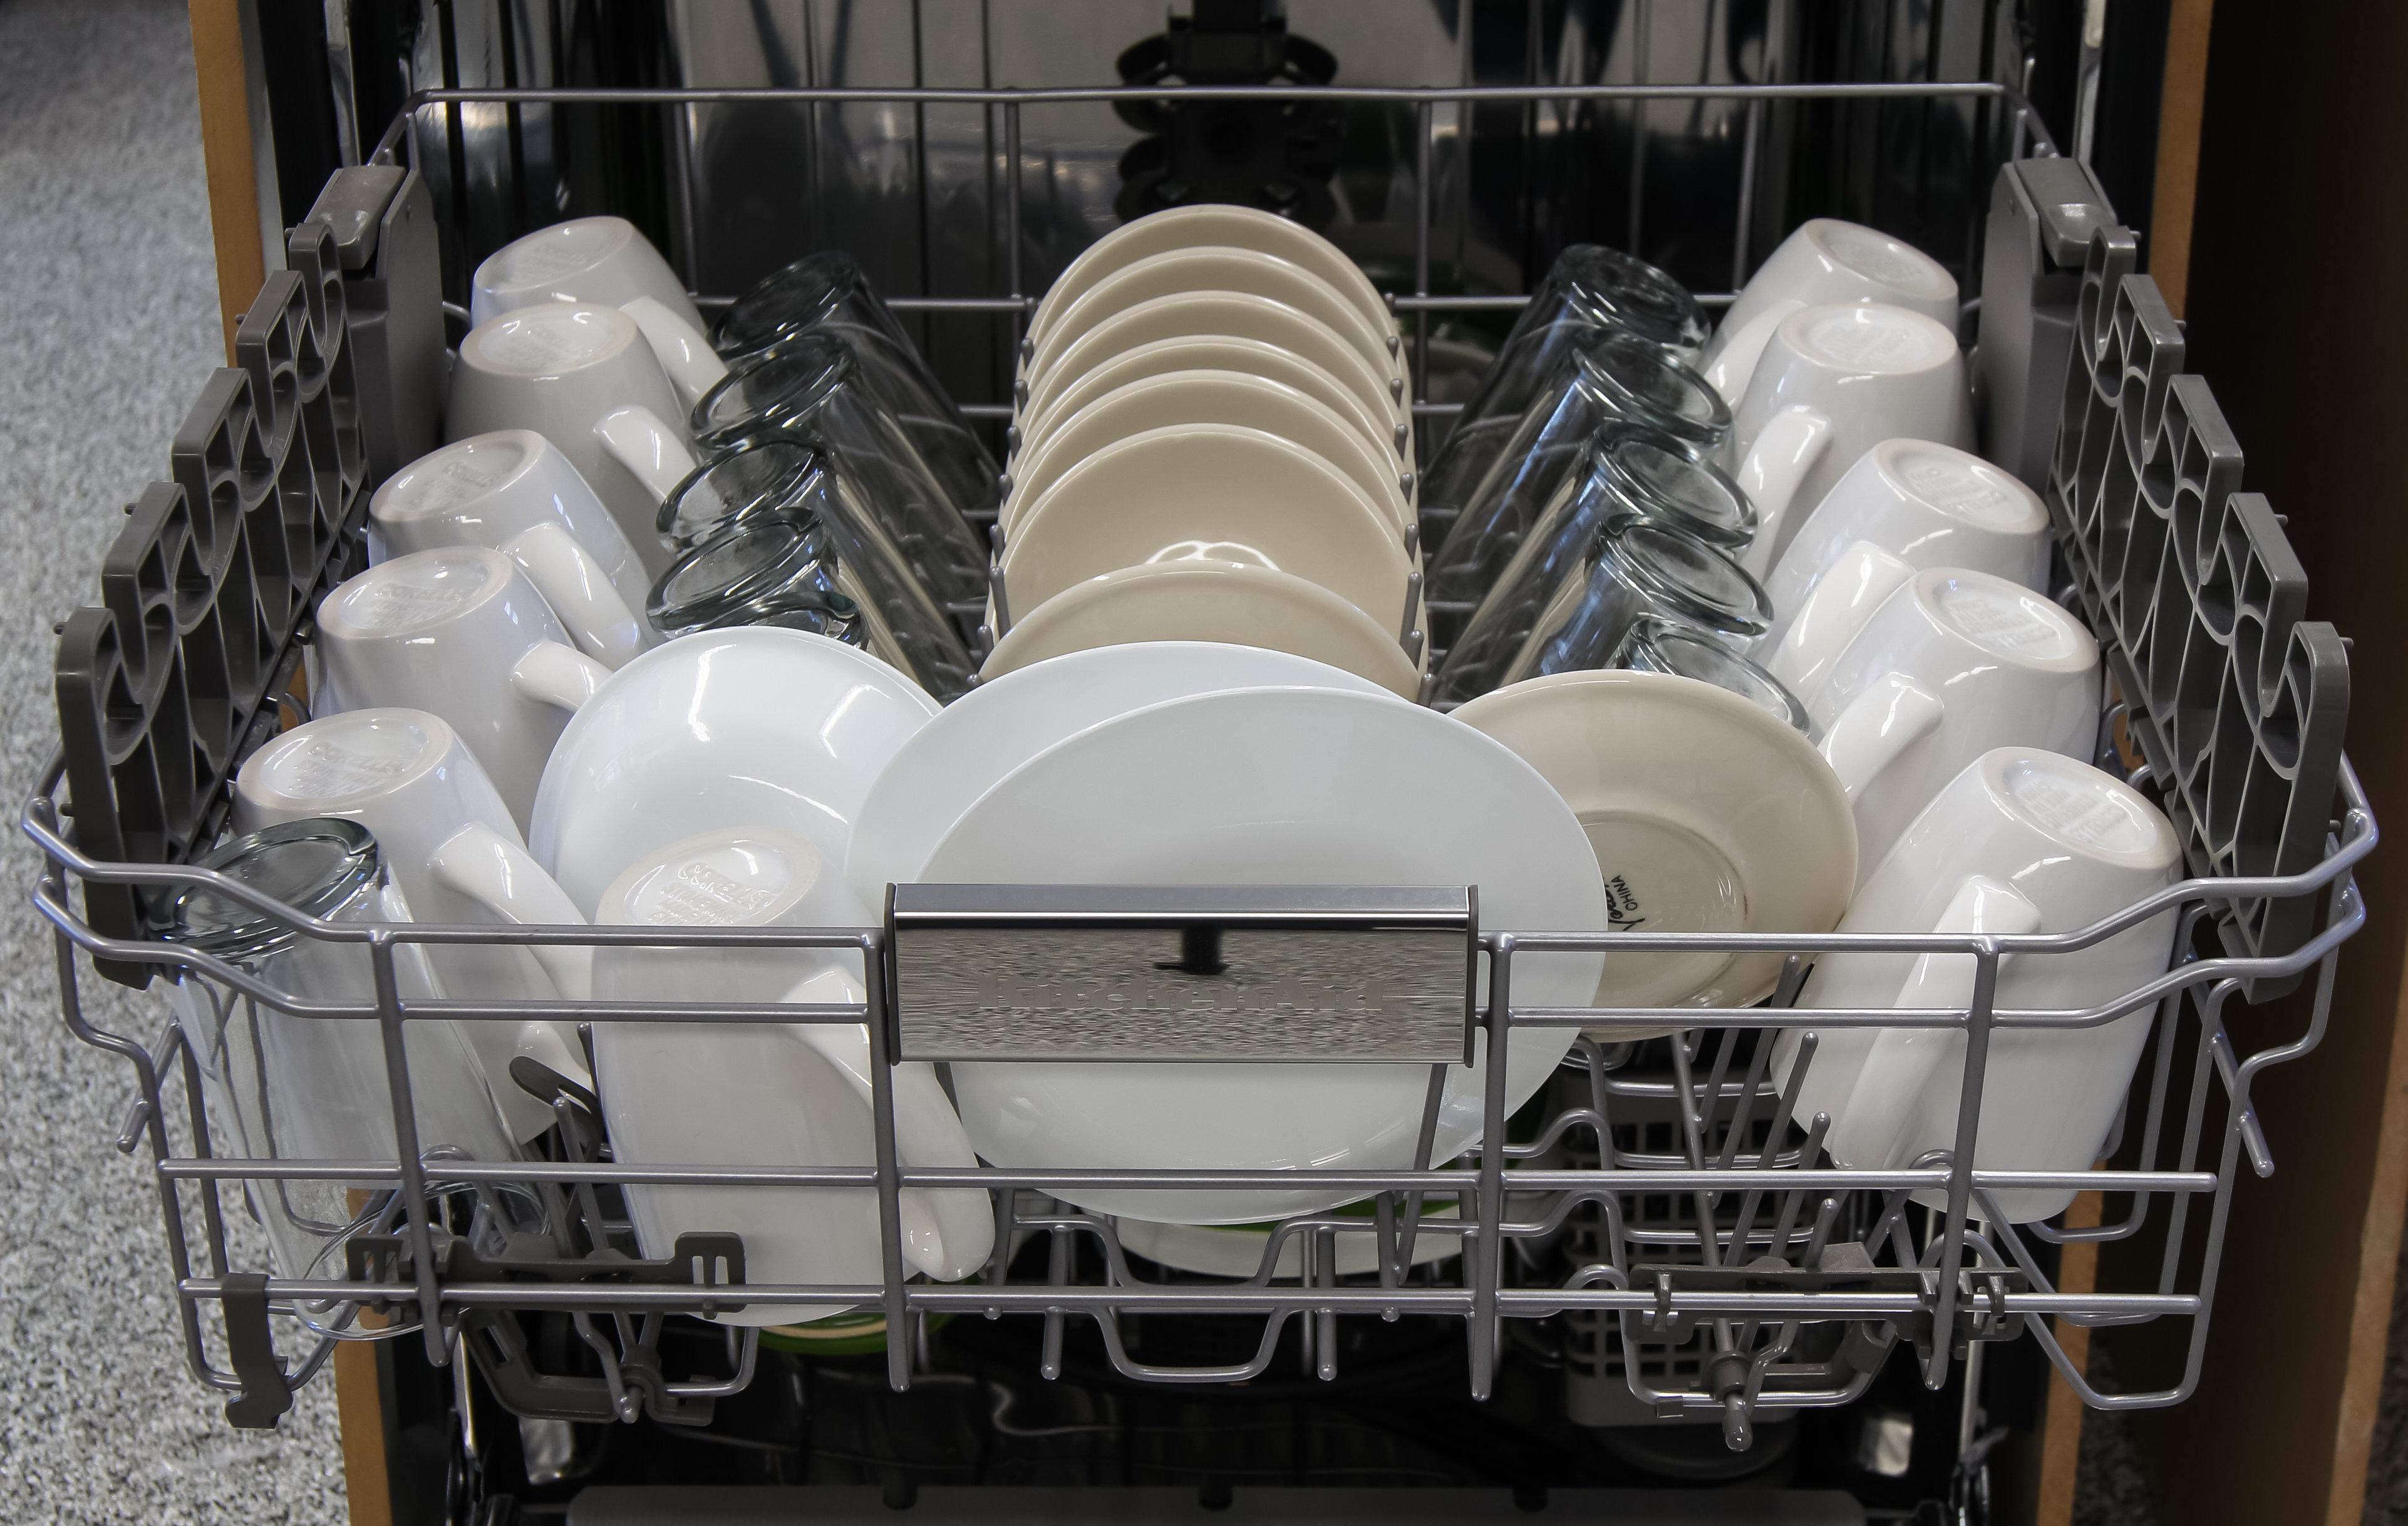 KitchenAid KDTM354DSS Top capacity